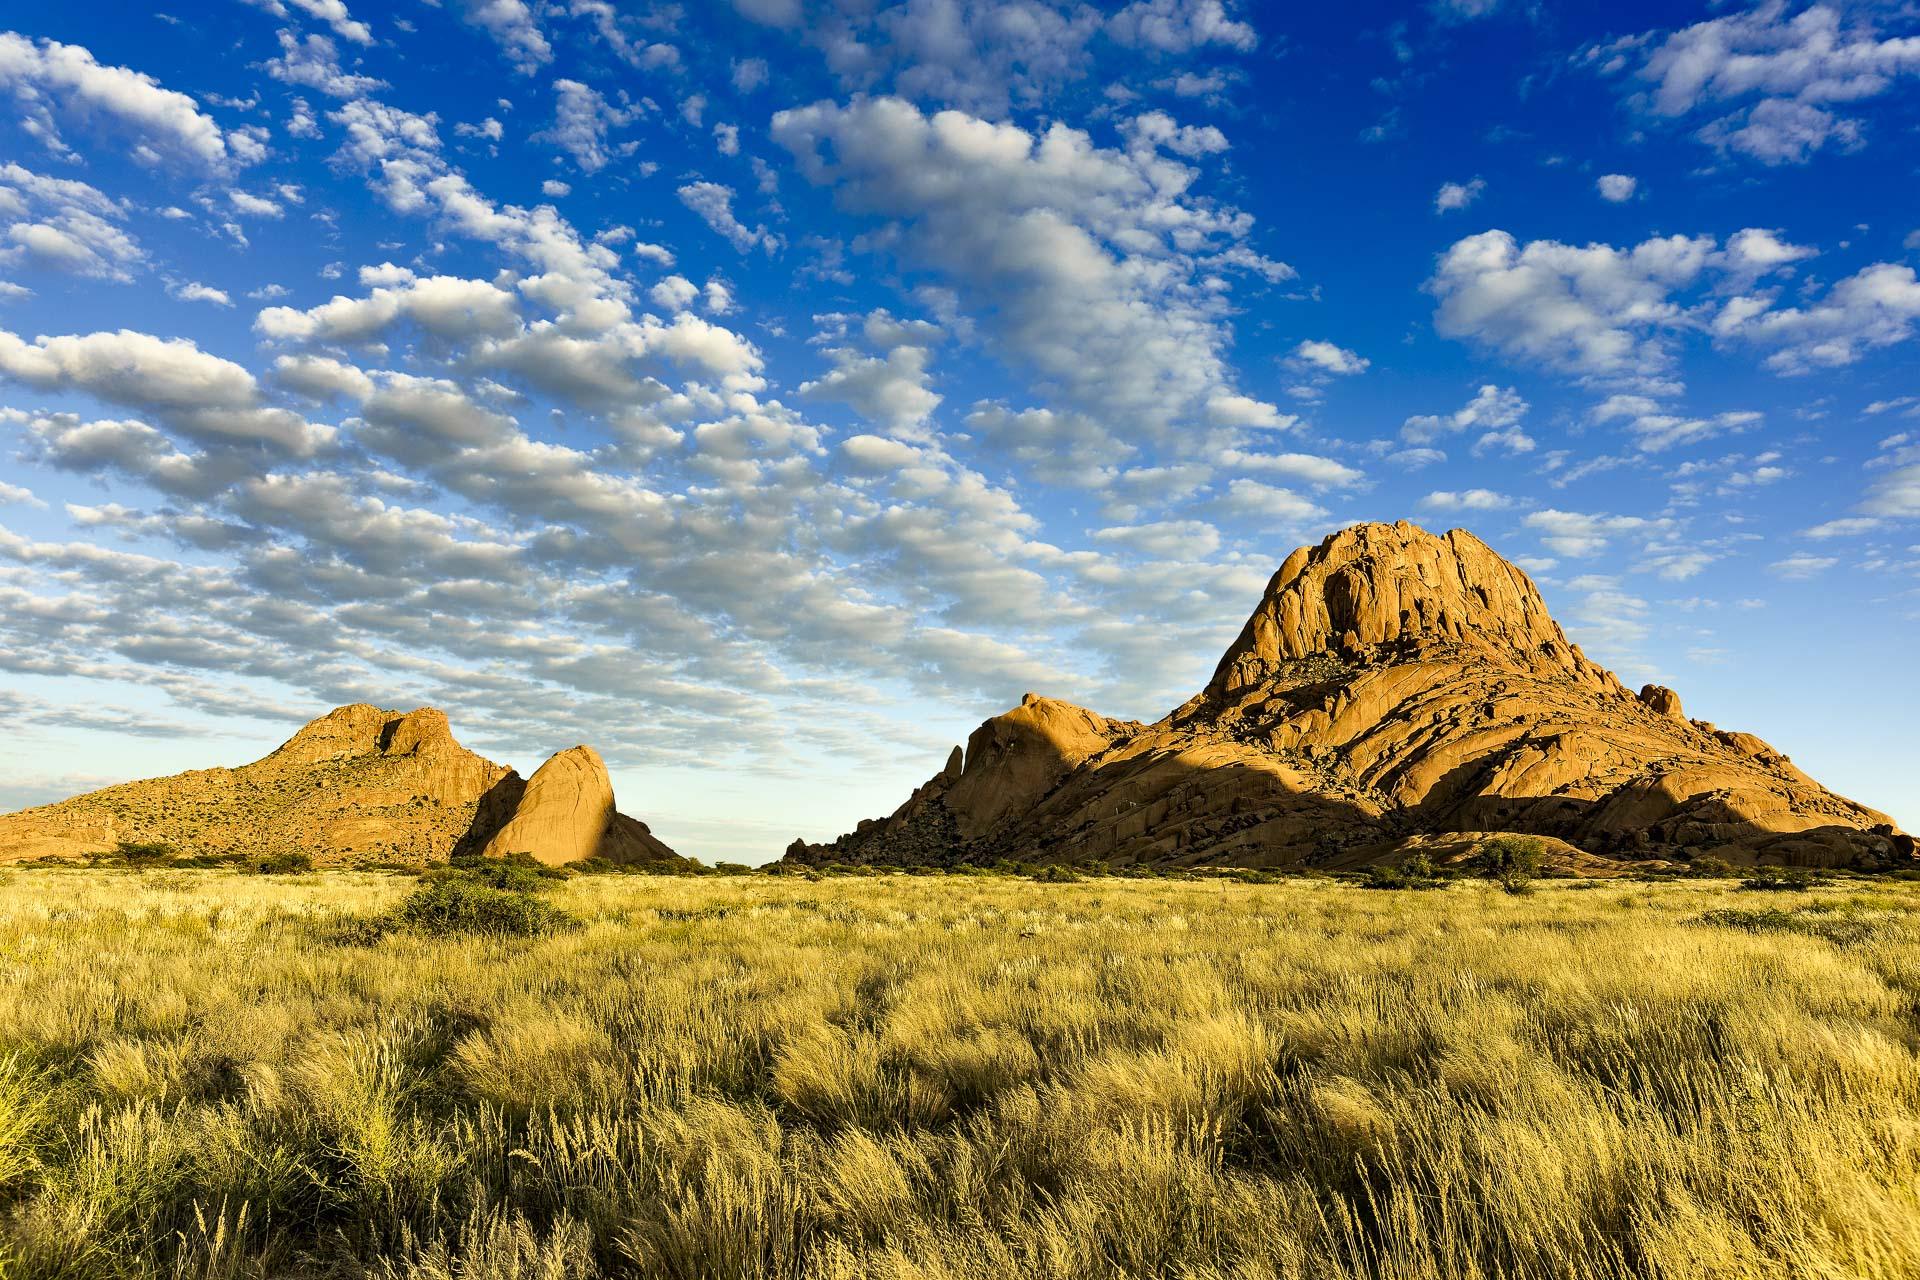 fotoreise-fotosafari-hd-2021-039-Namibia